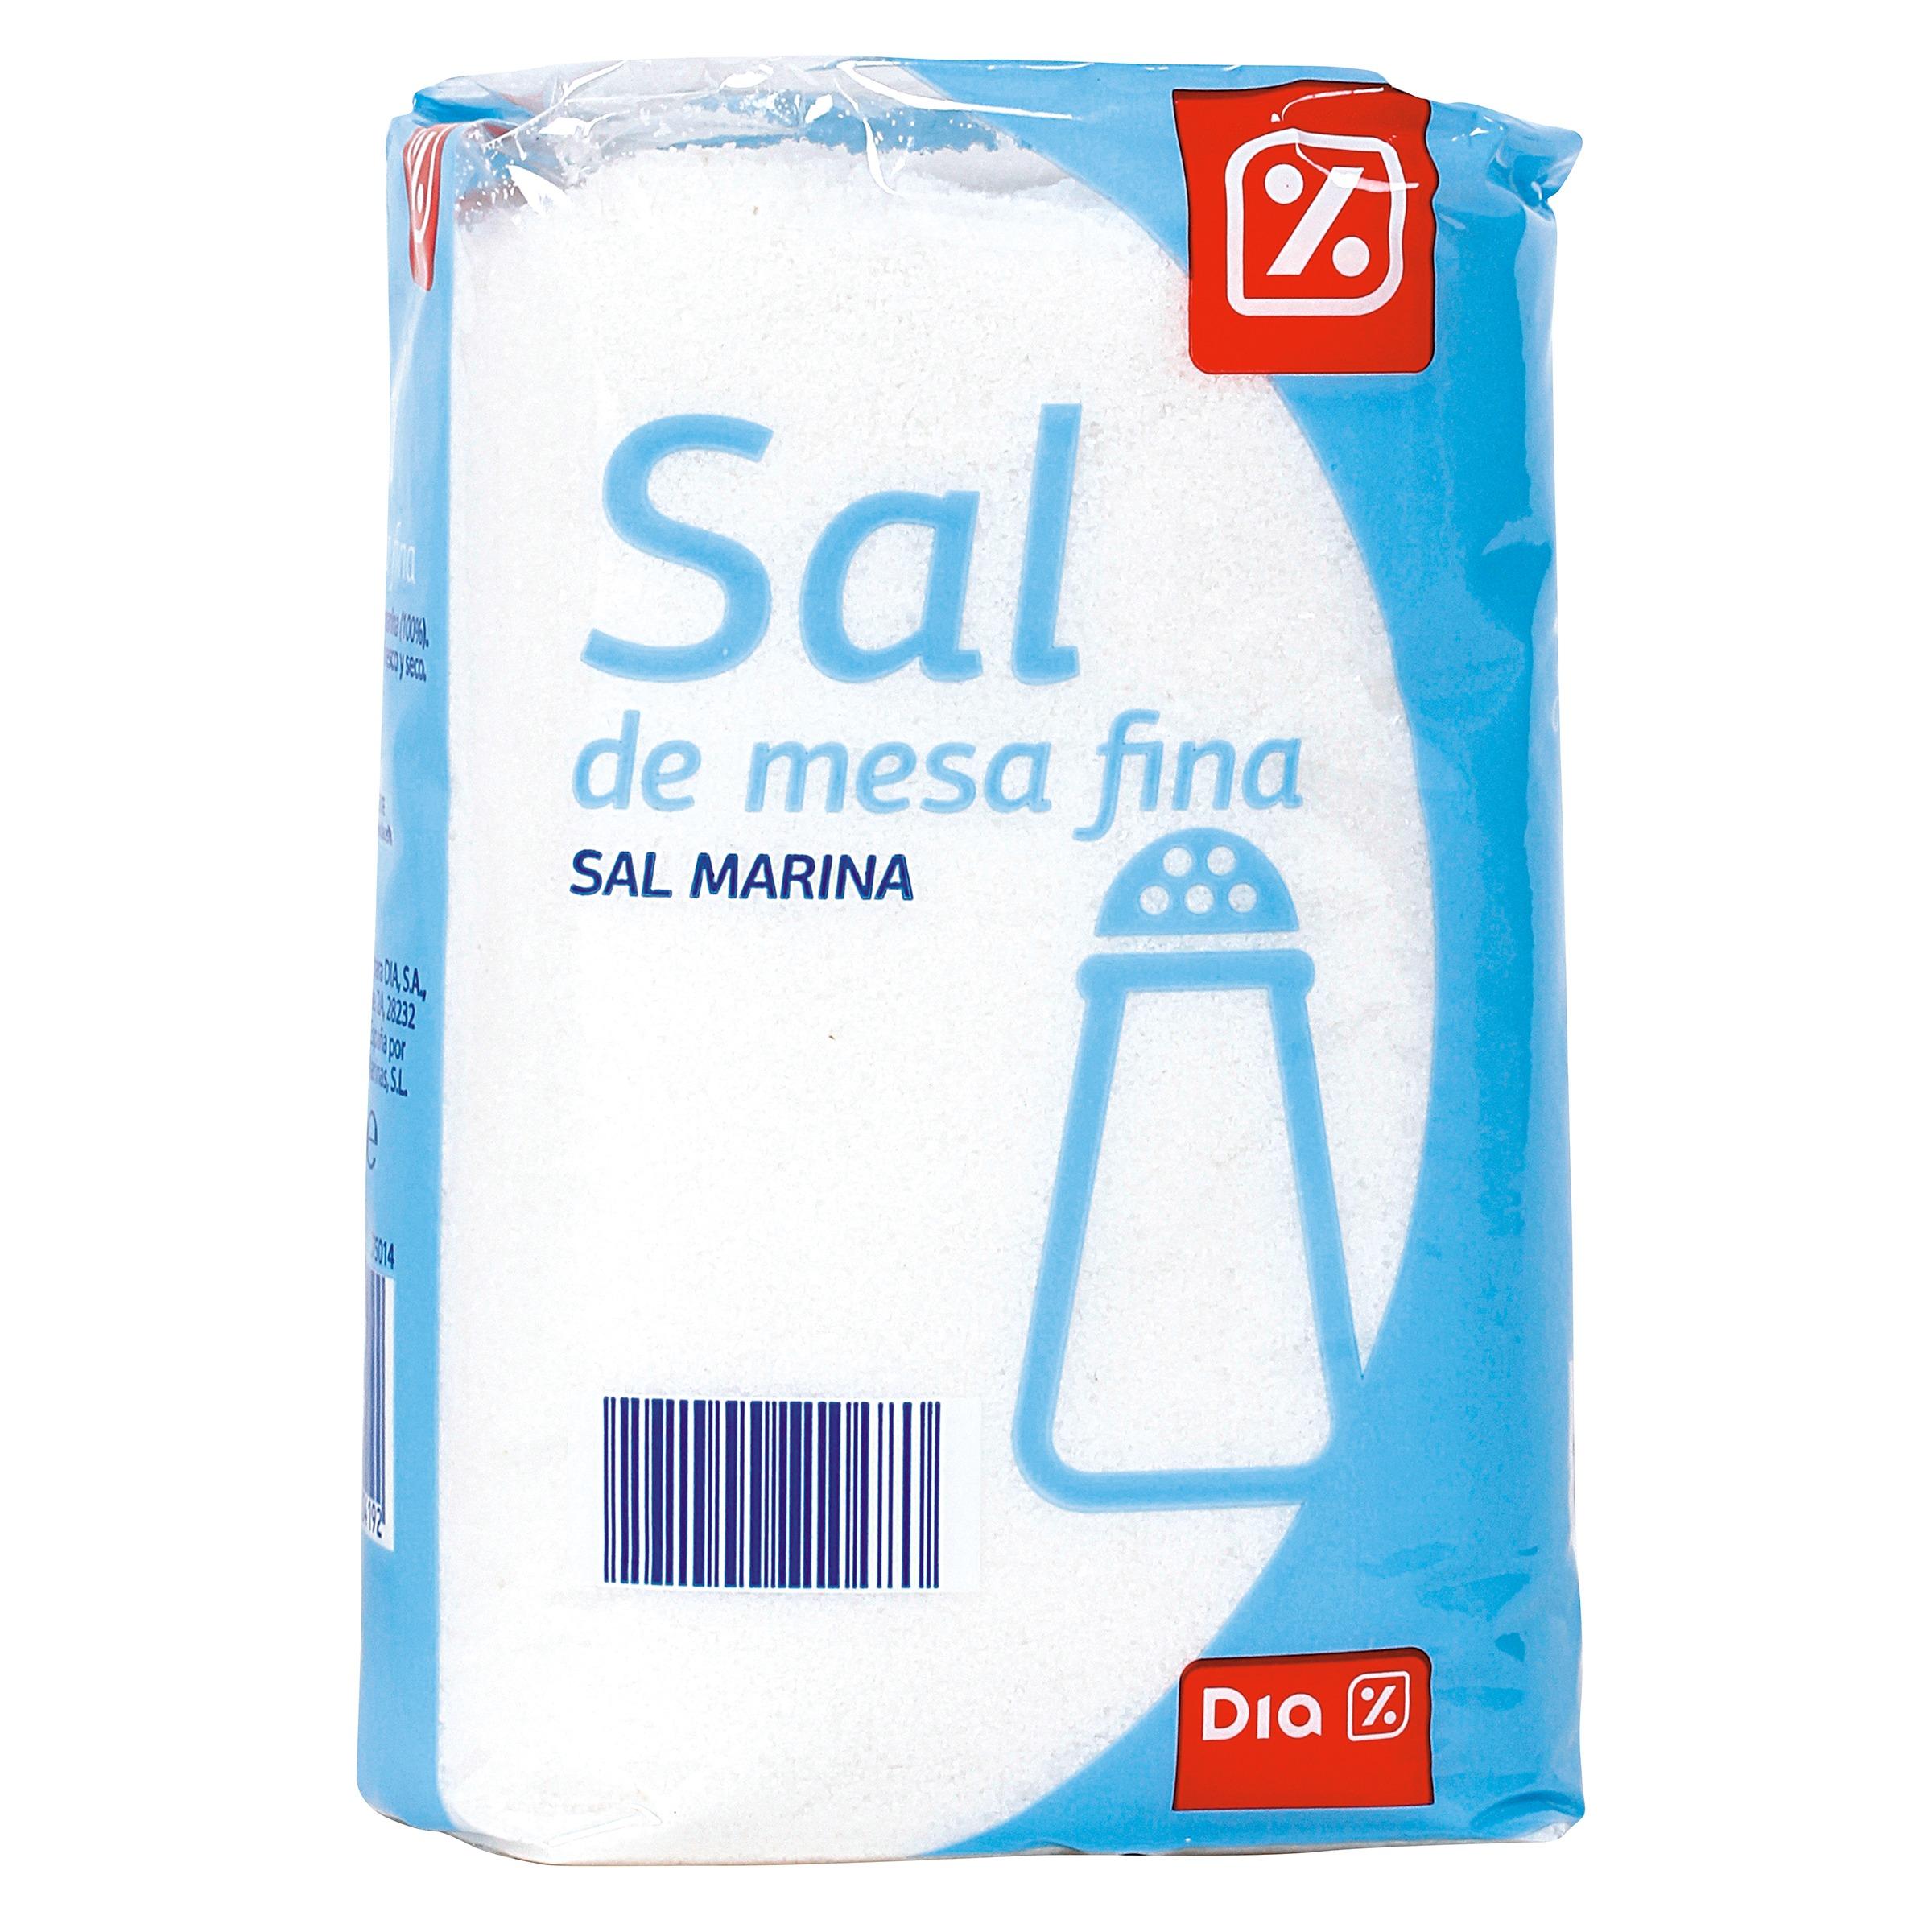 Dia sal de mesa fina paquete 1 kg sal supermercados dia - Sal para piscinas precio ...